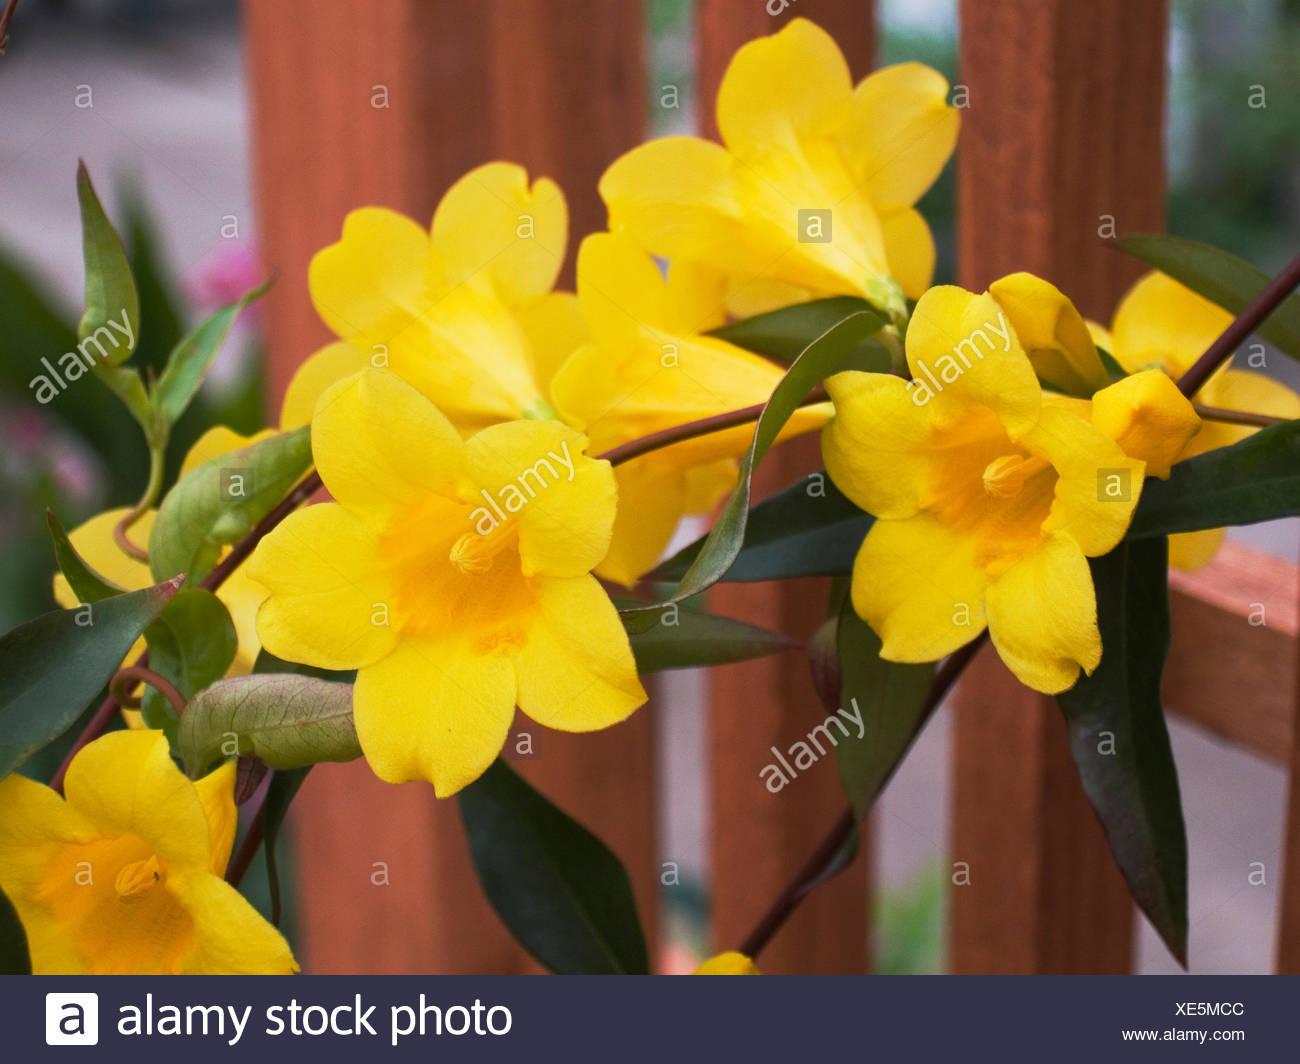 Carolina jasmine stock photos carolina jasmine stock images alamy gelsemium sempervirens carolina jasmine stock image izmirmasajfo